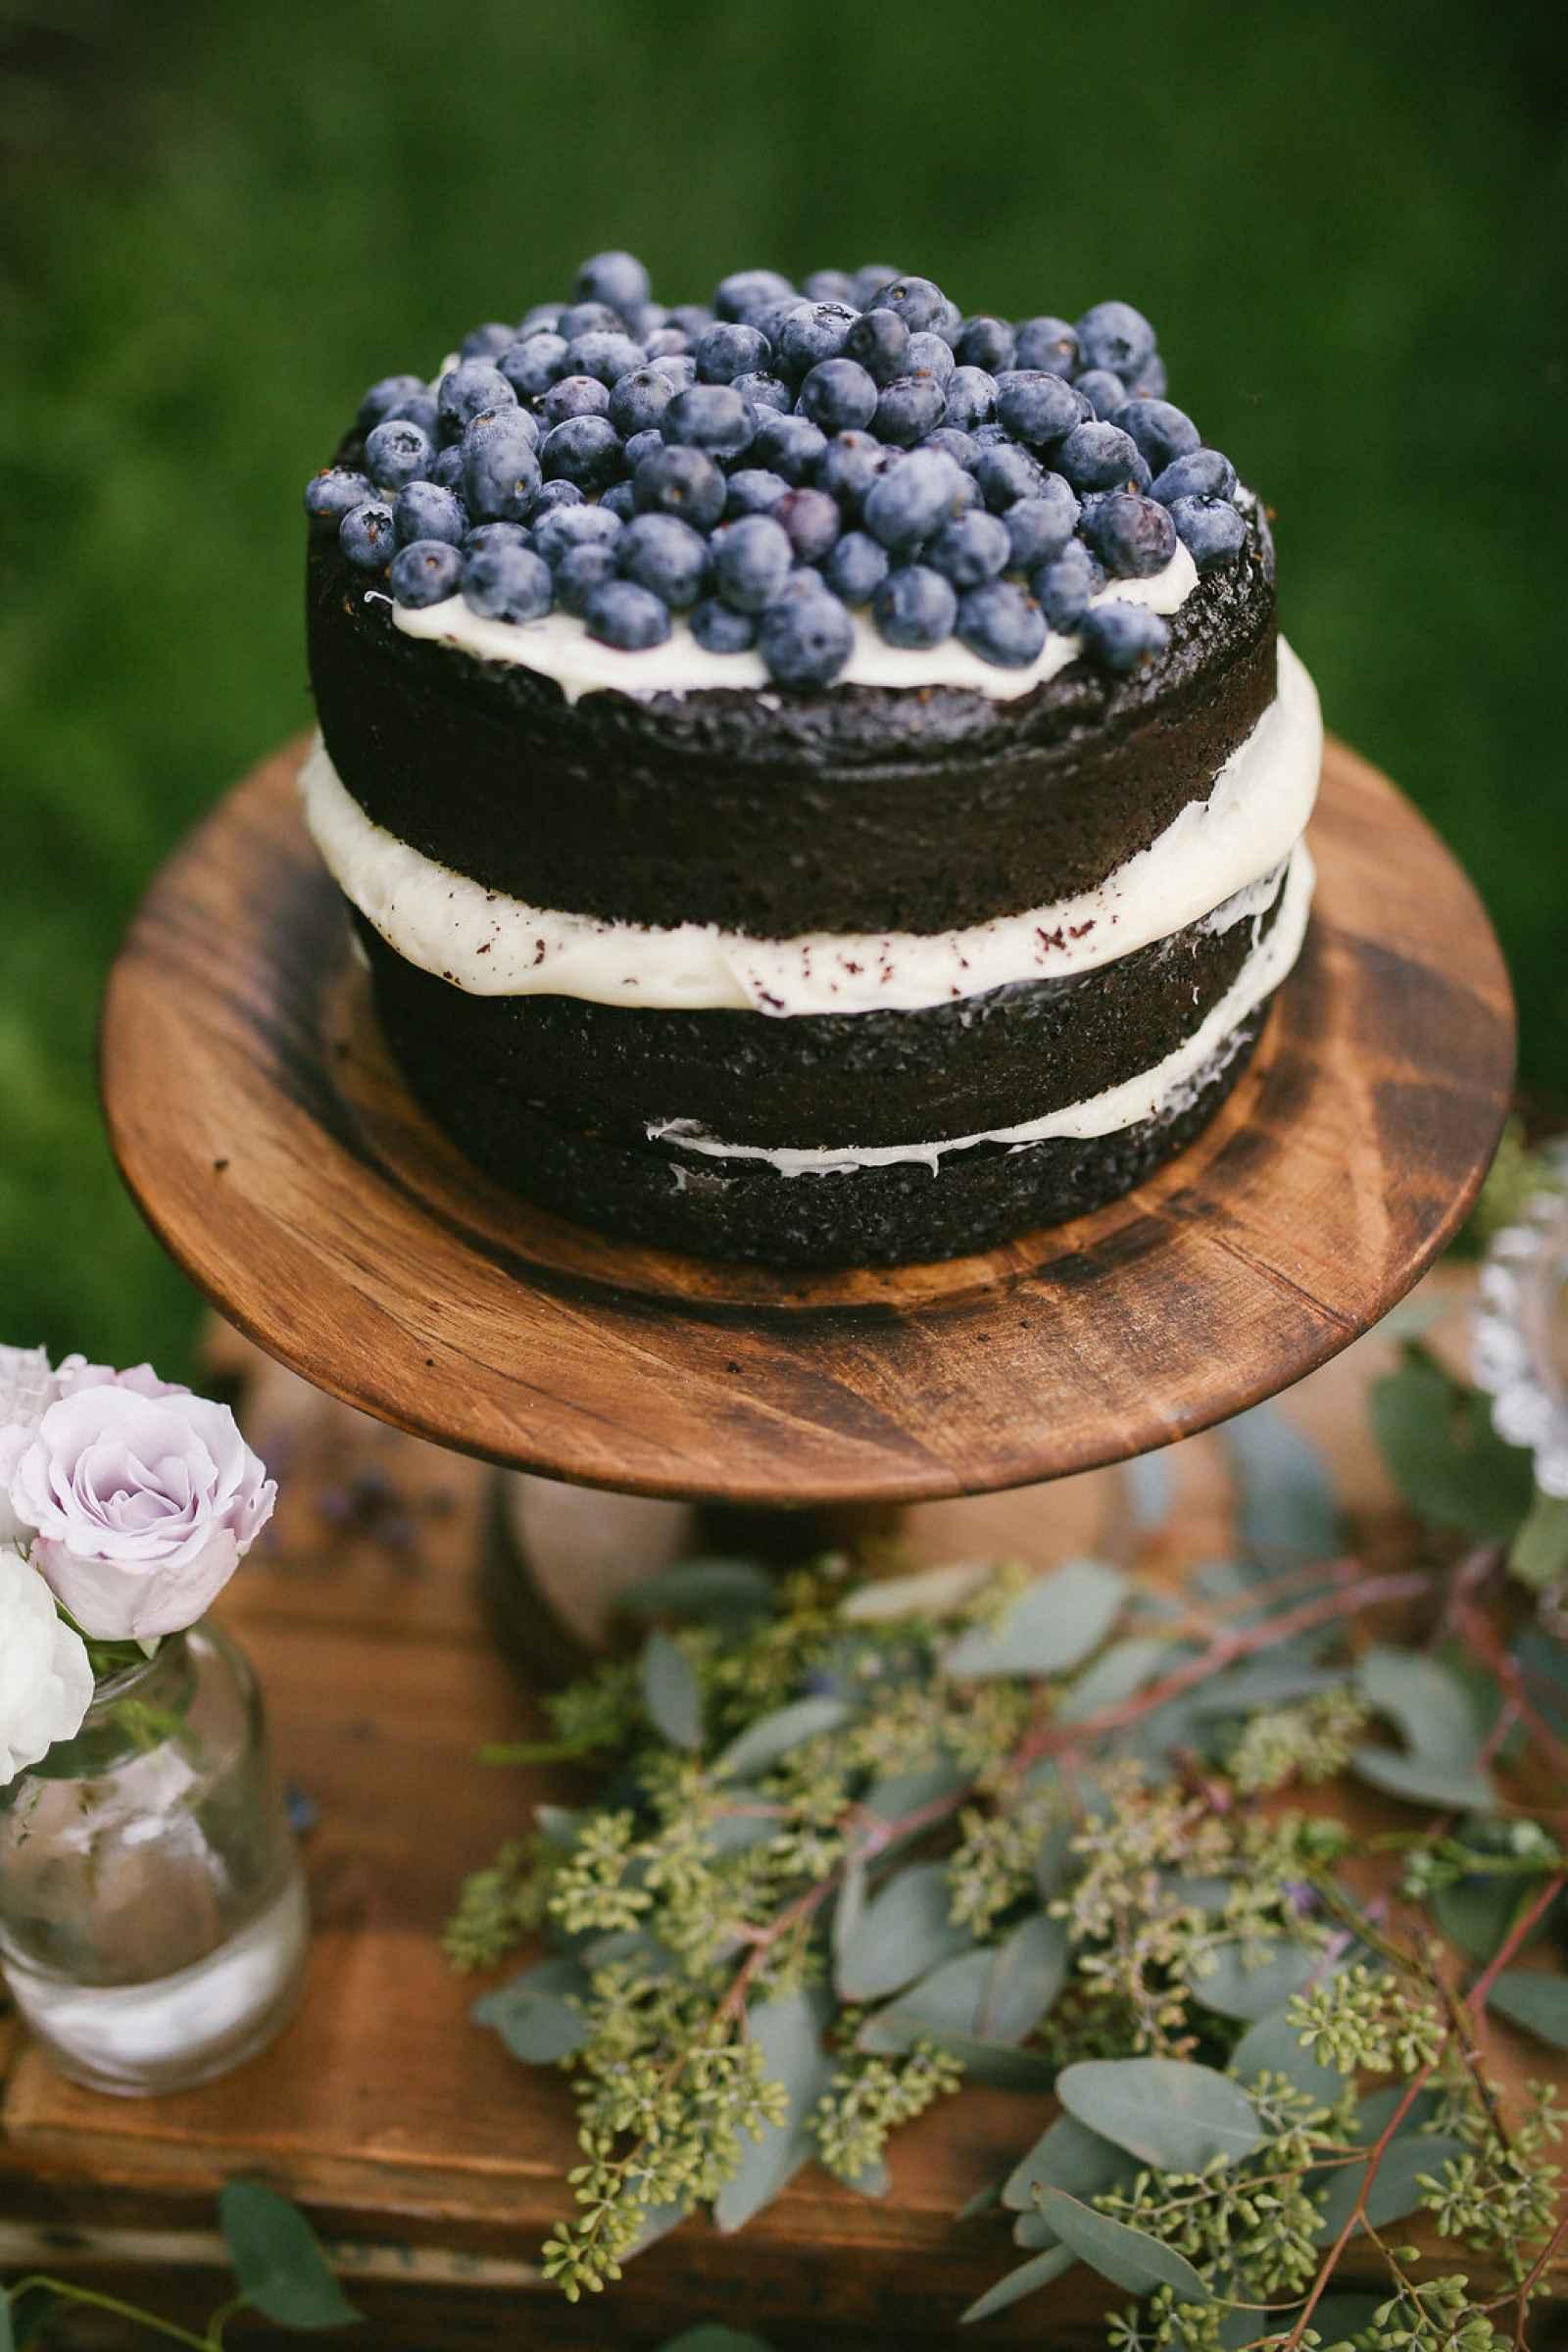 A michigan blueberry farm soir e weddingday magazine for French country magazine online